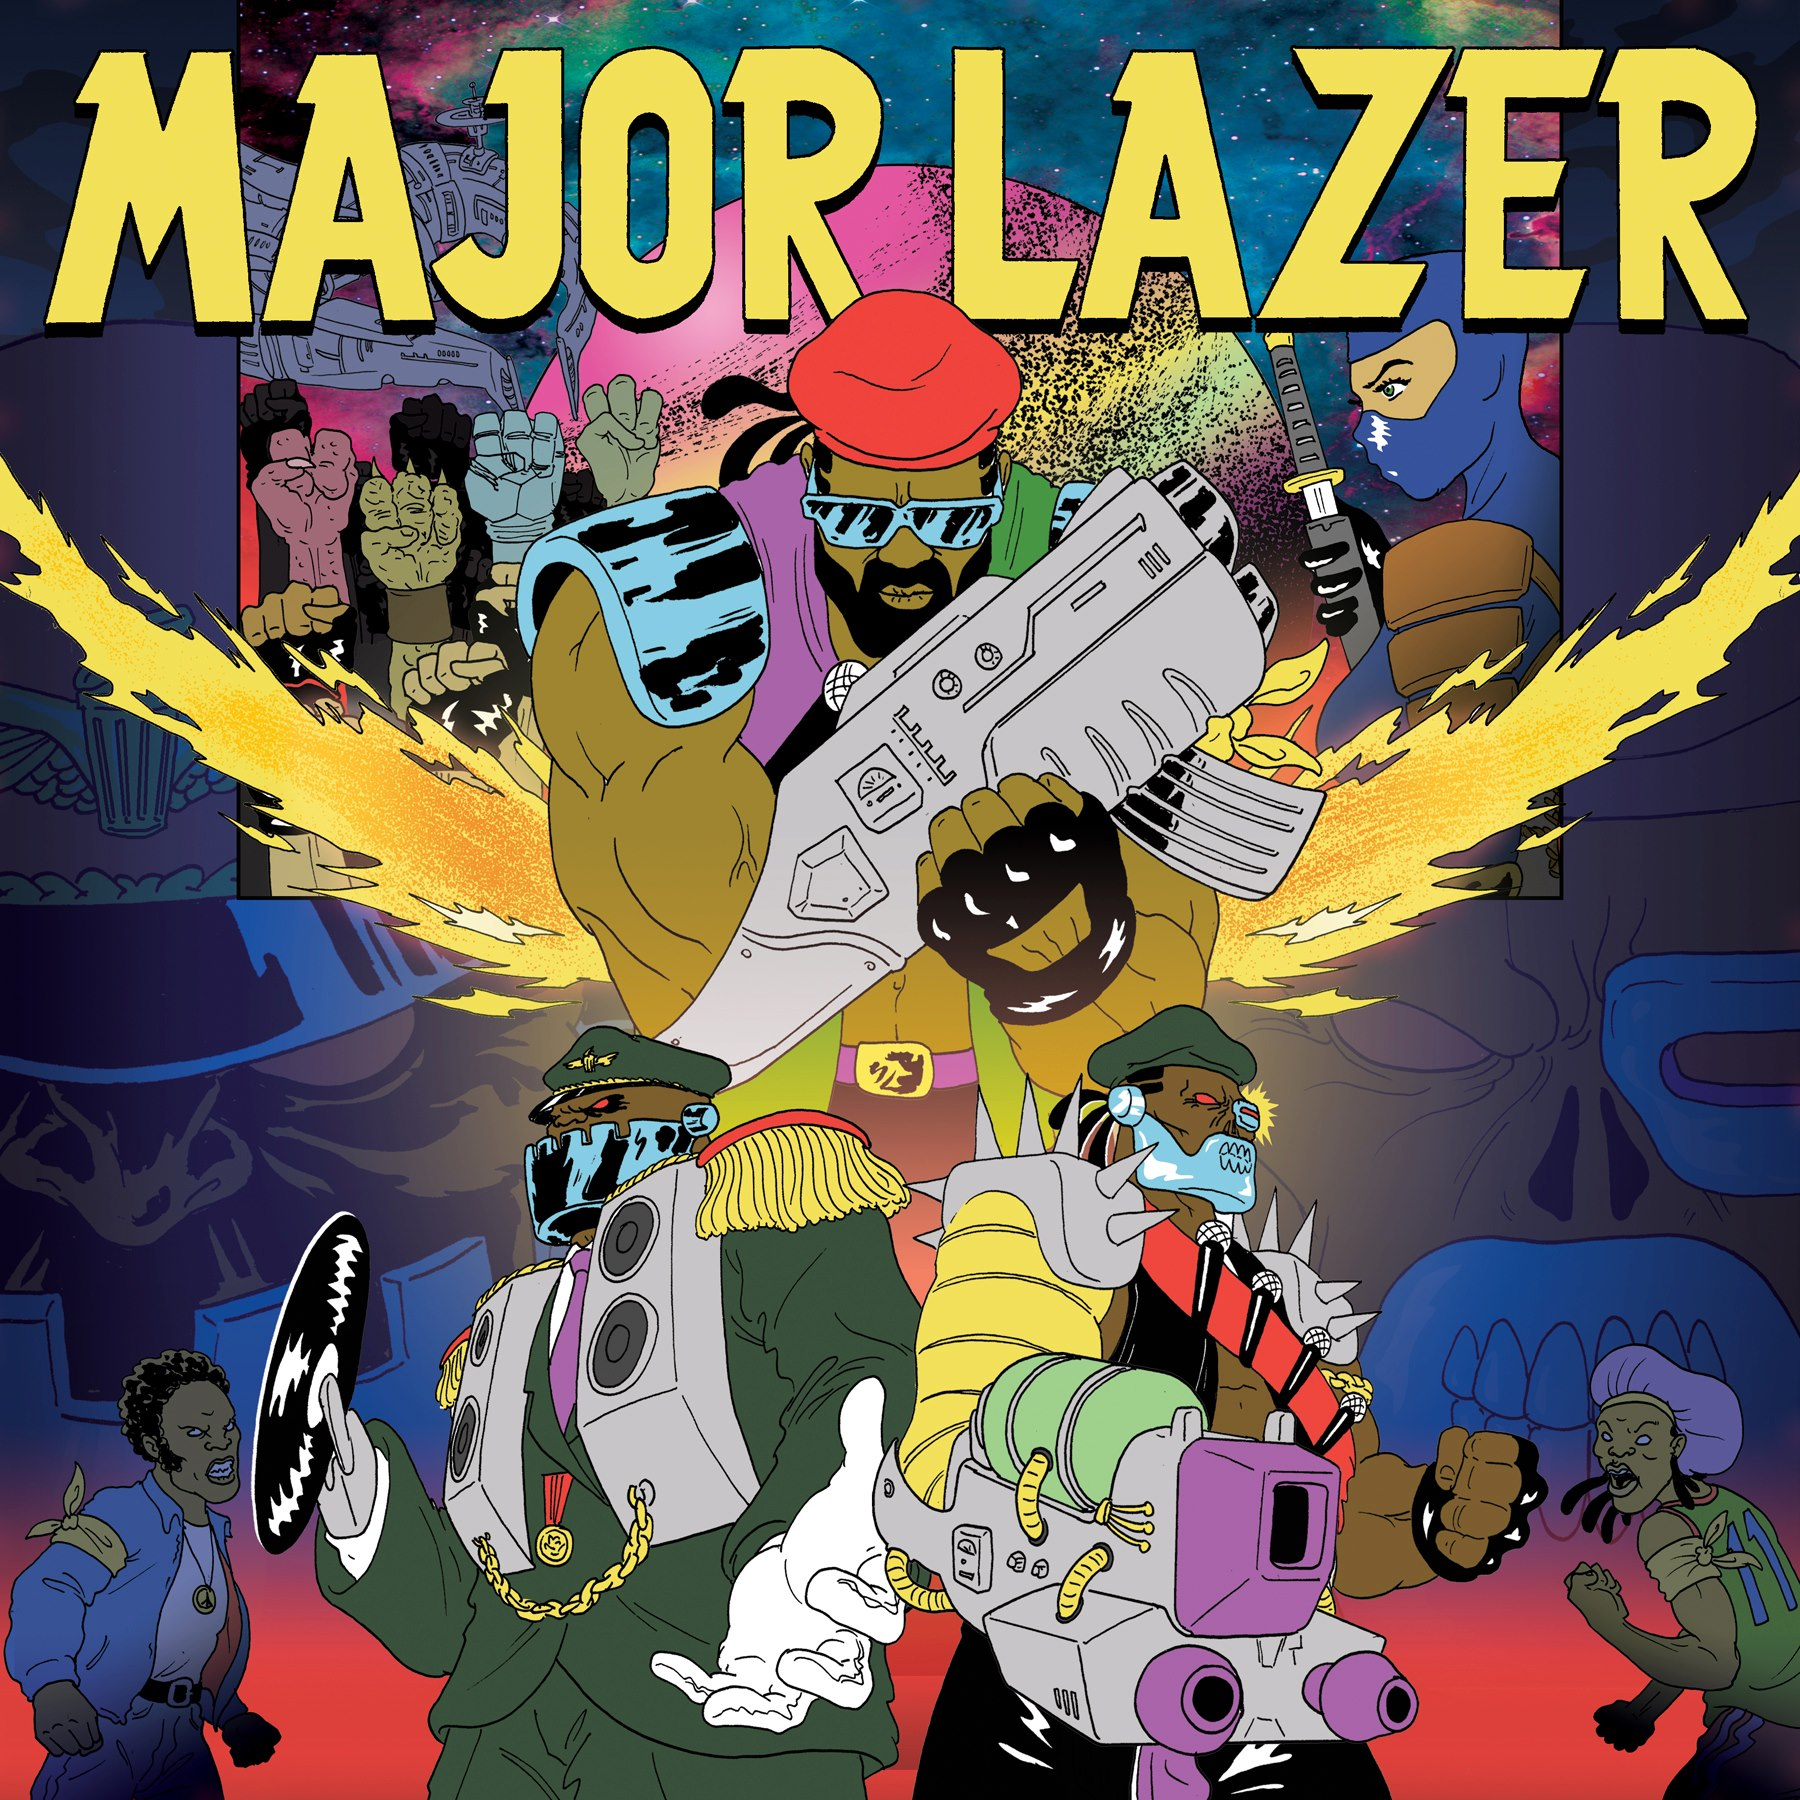 major-lazer-freetheuniverse